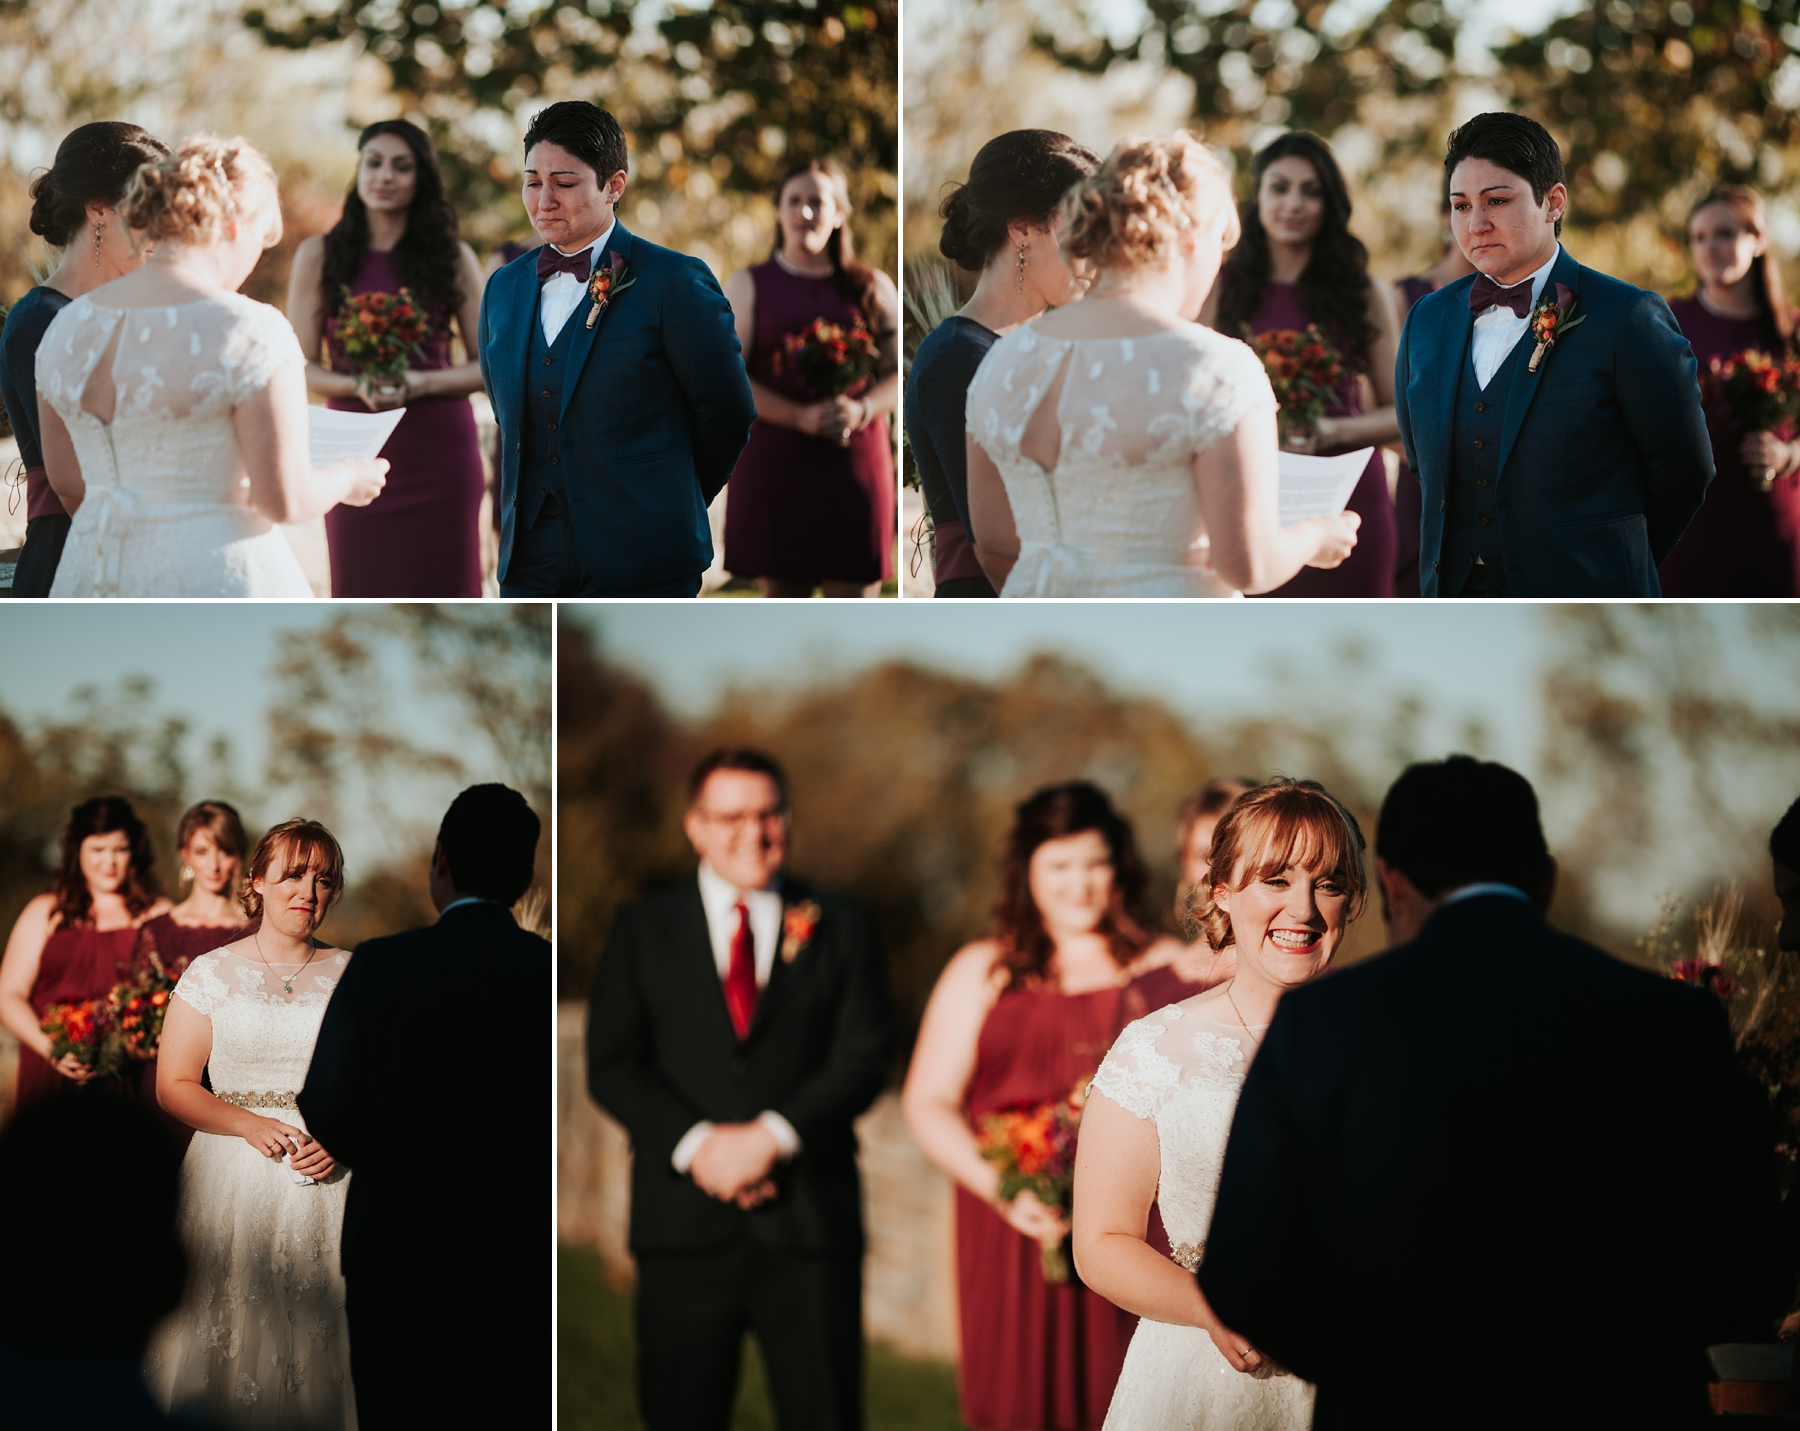 Bluemont Vineyard Wedding, Same-sex wedding, queer wedding in virginia